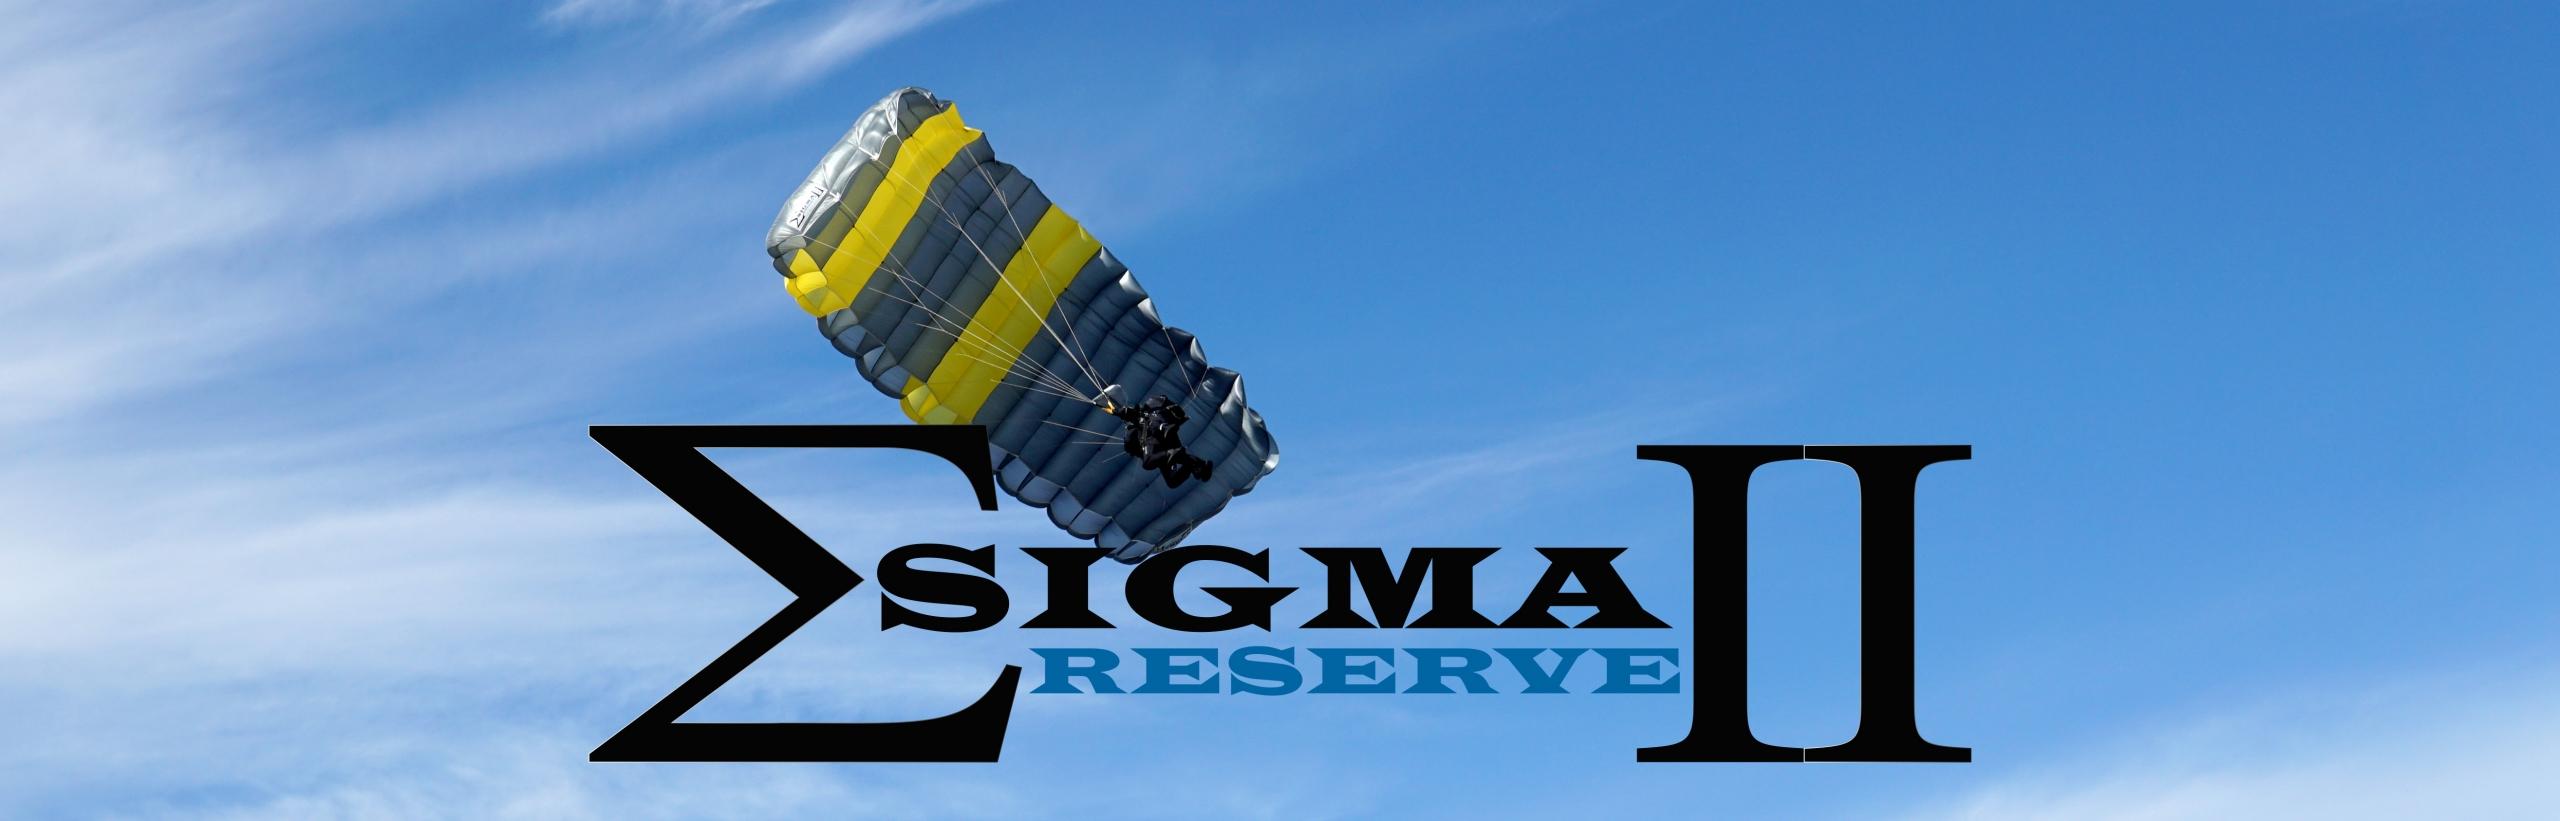 Sigma II Reserve